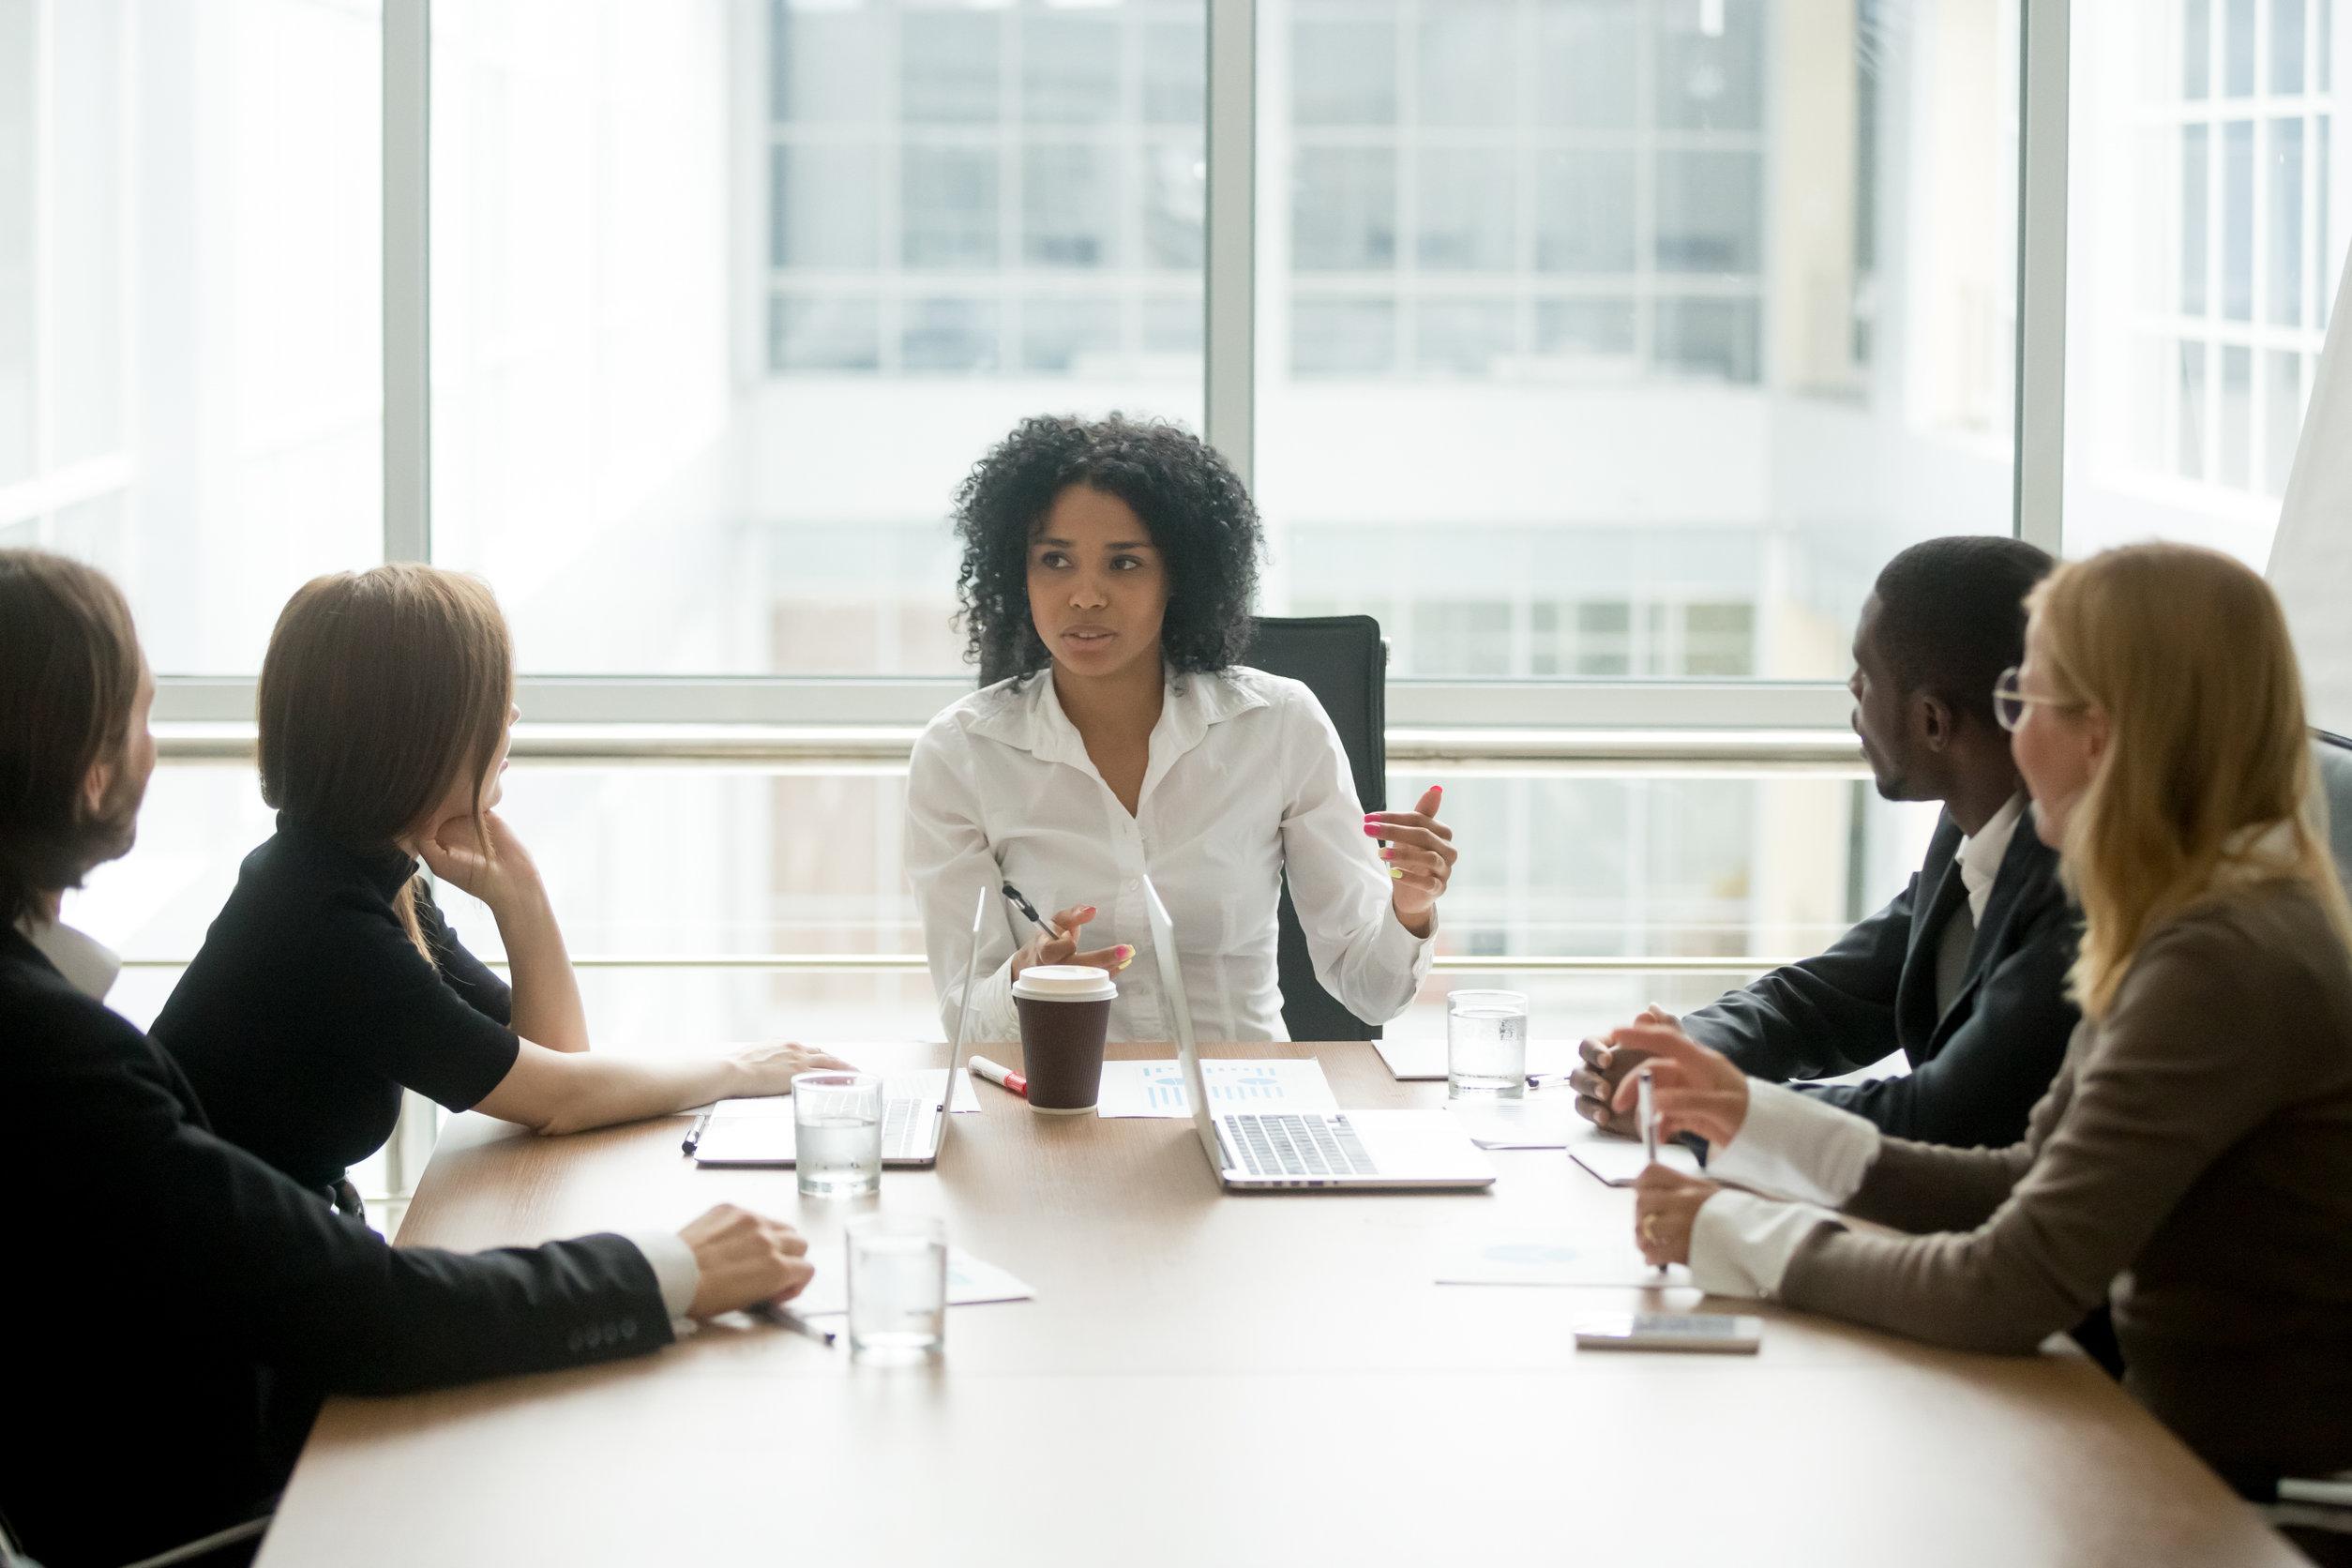 La Agencia Tributaria crea una comisión consultiva de ética | Sala de prensa Grupo Asesor ADADE y E-Consulting Global Group